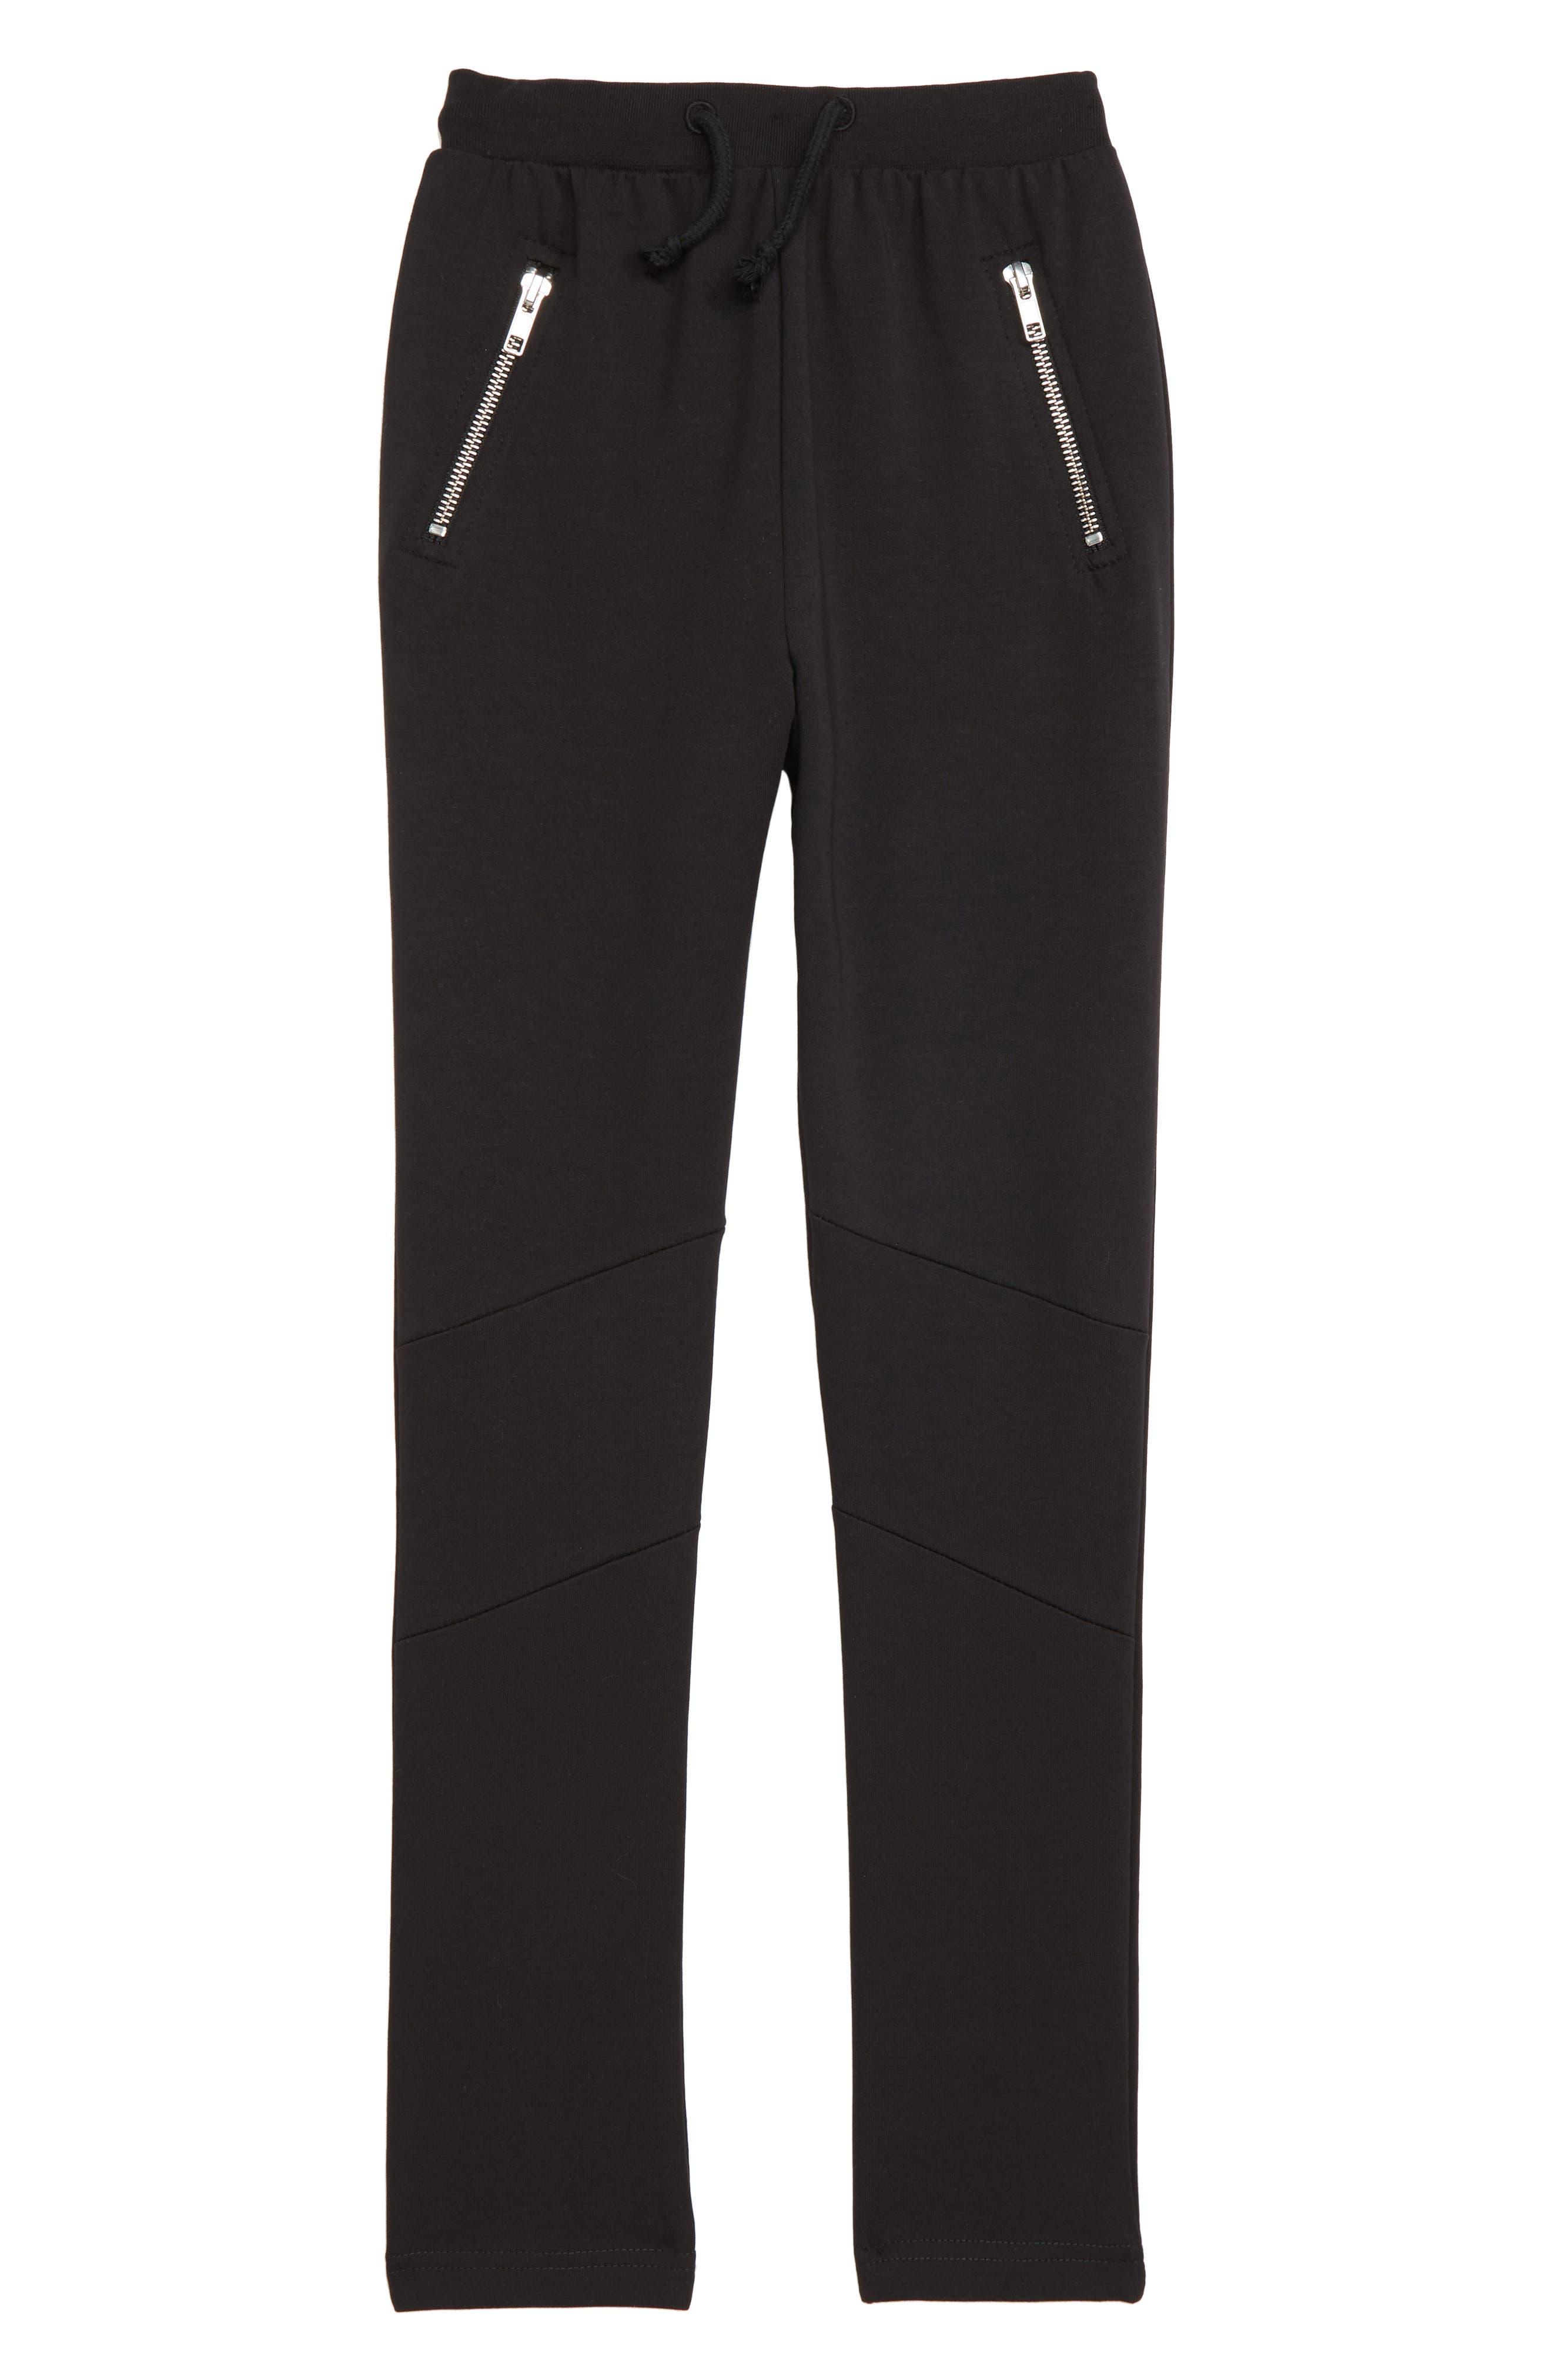 Boys Sometime Soon Anton Sweatpants Size 5Y  Black